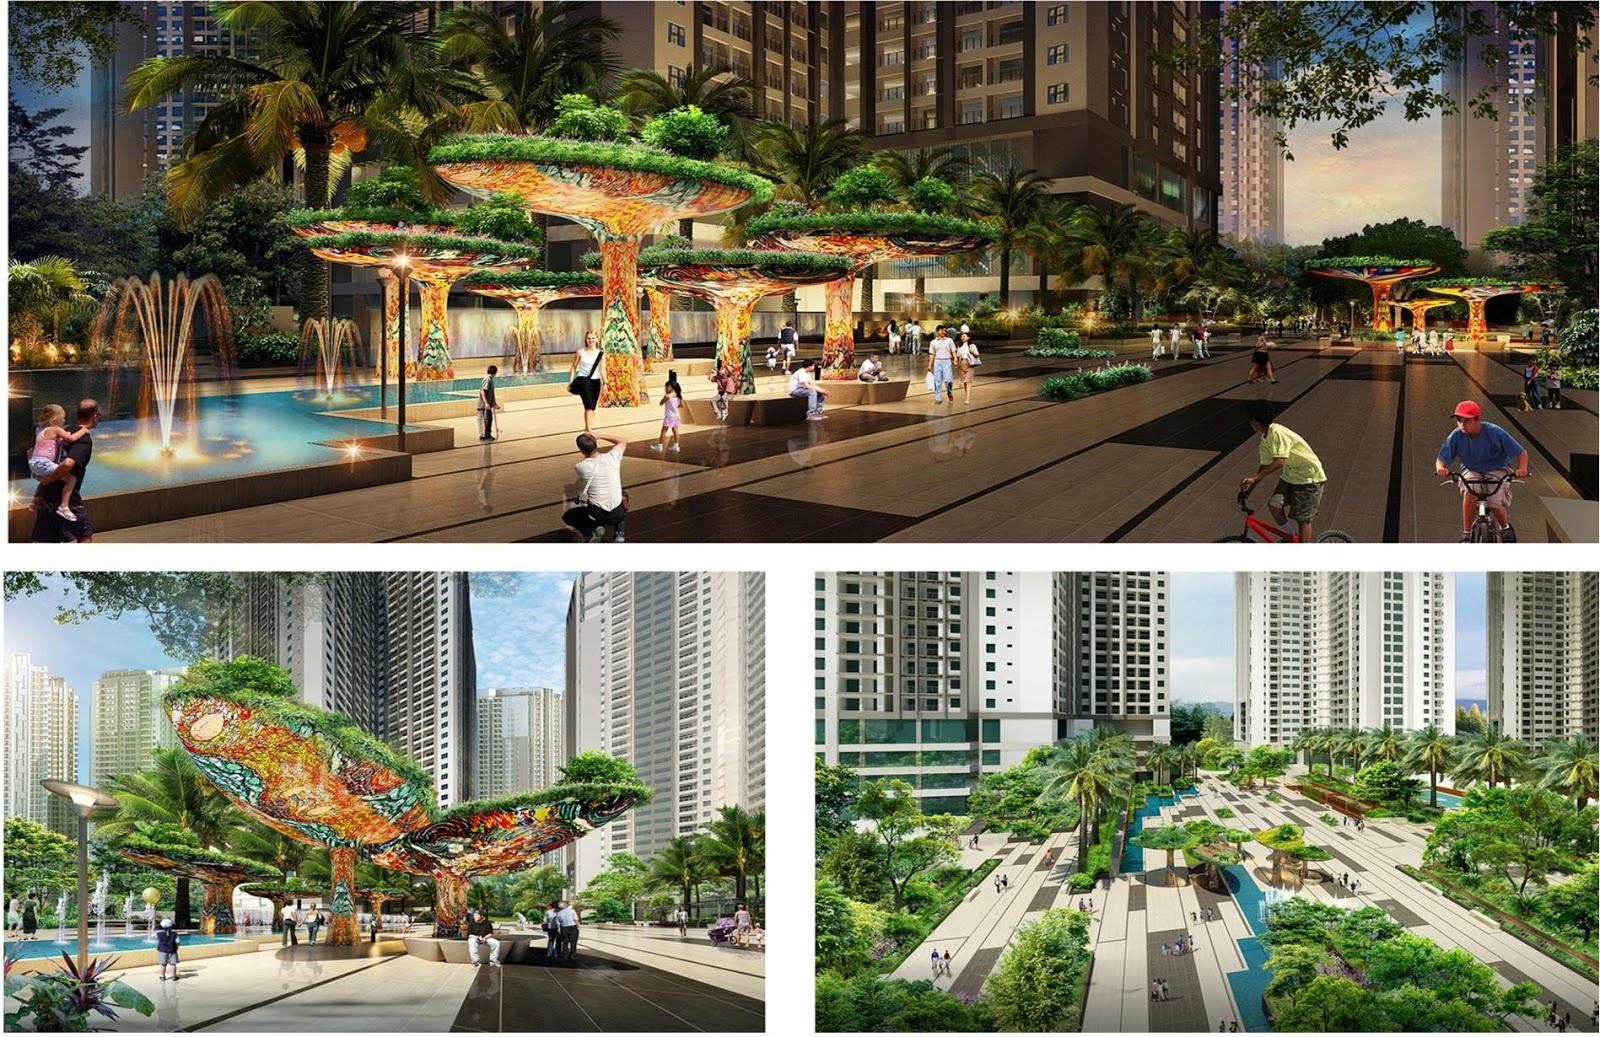 Giá bán chung cư Imperia Sky Garden 423 Minh Khai Hai Bà Trưng